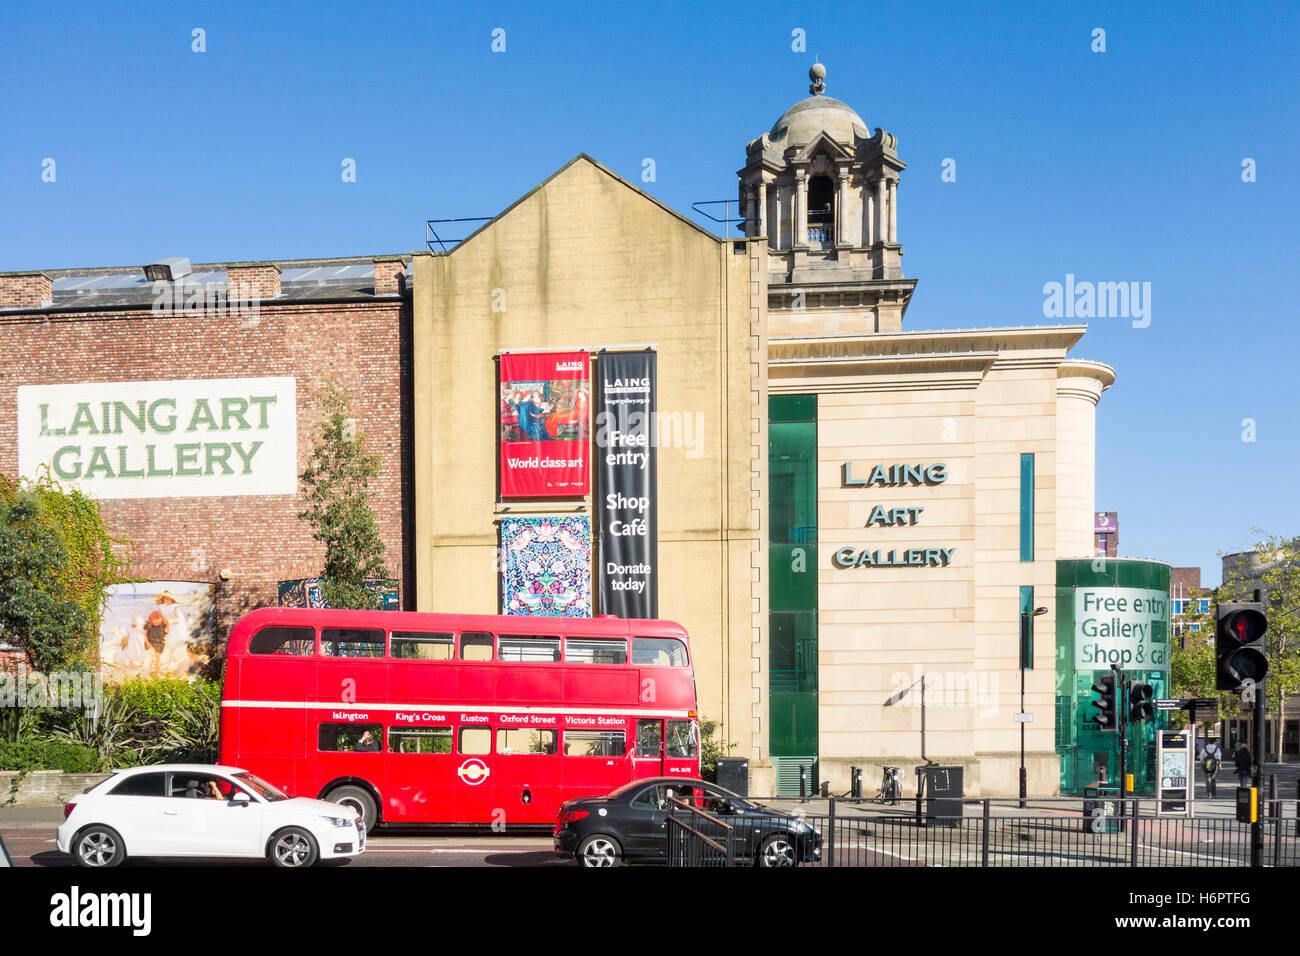 Laing Art Gallery in Newcastle upon Tyne, England. UK Stock Photo